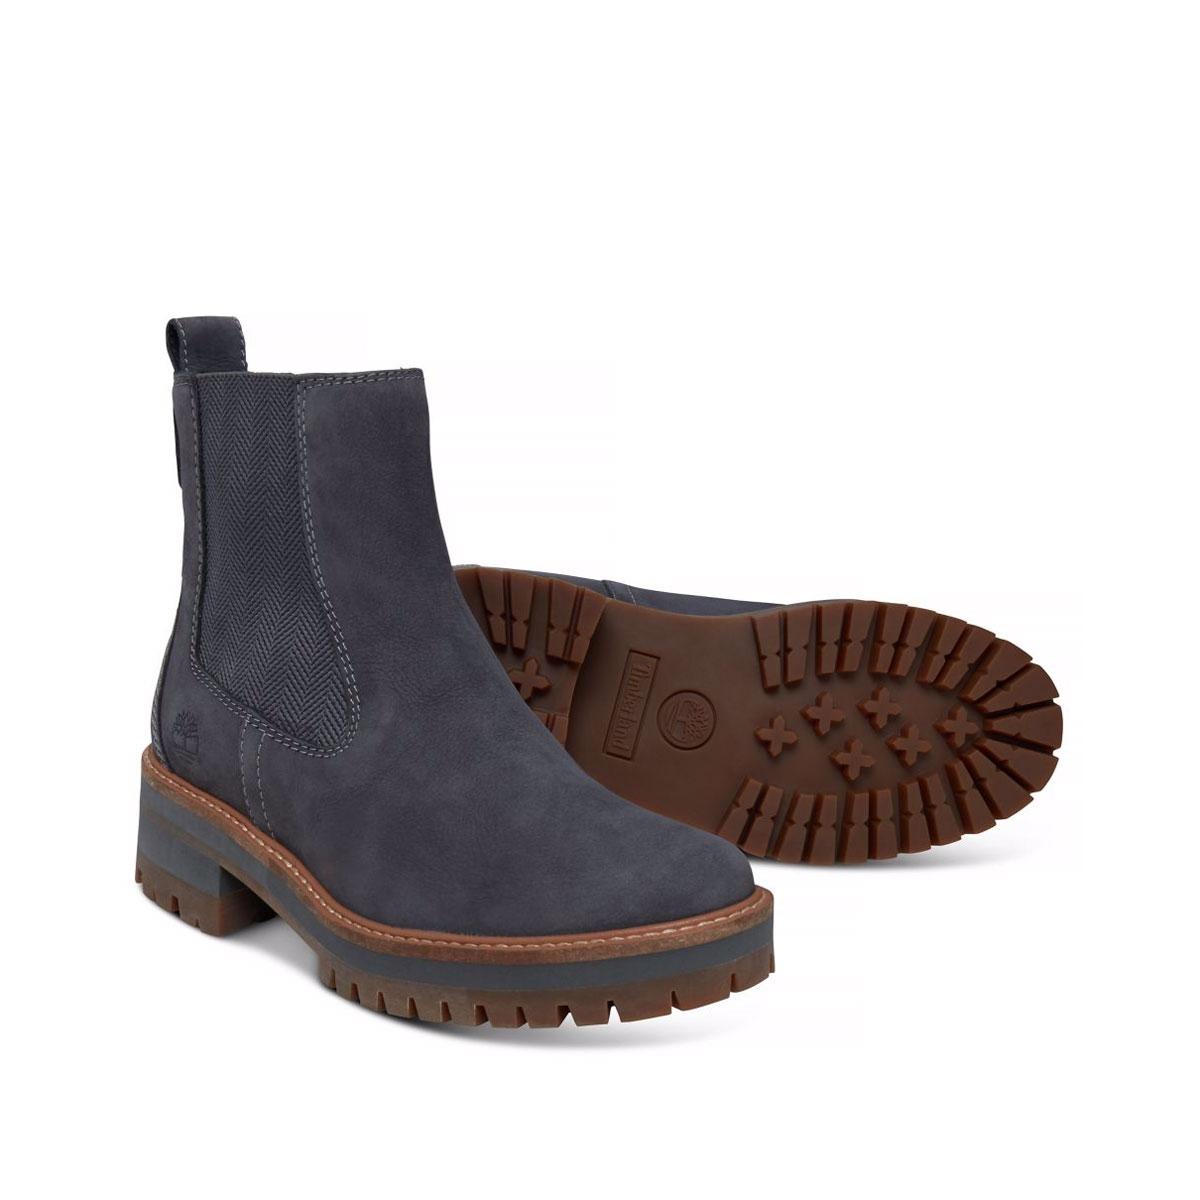 f881843053 Image of Timberland Courmayeur Valley Chelsea Boots (Women's) - Dark Grey  Nubuck ...